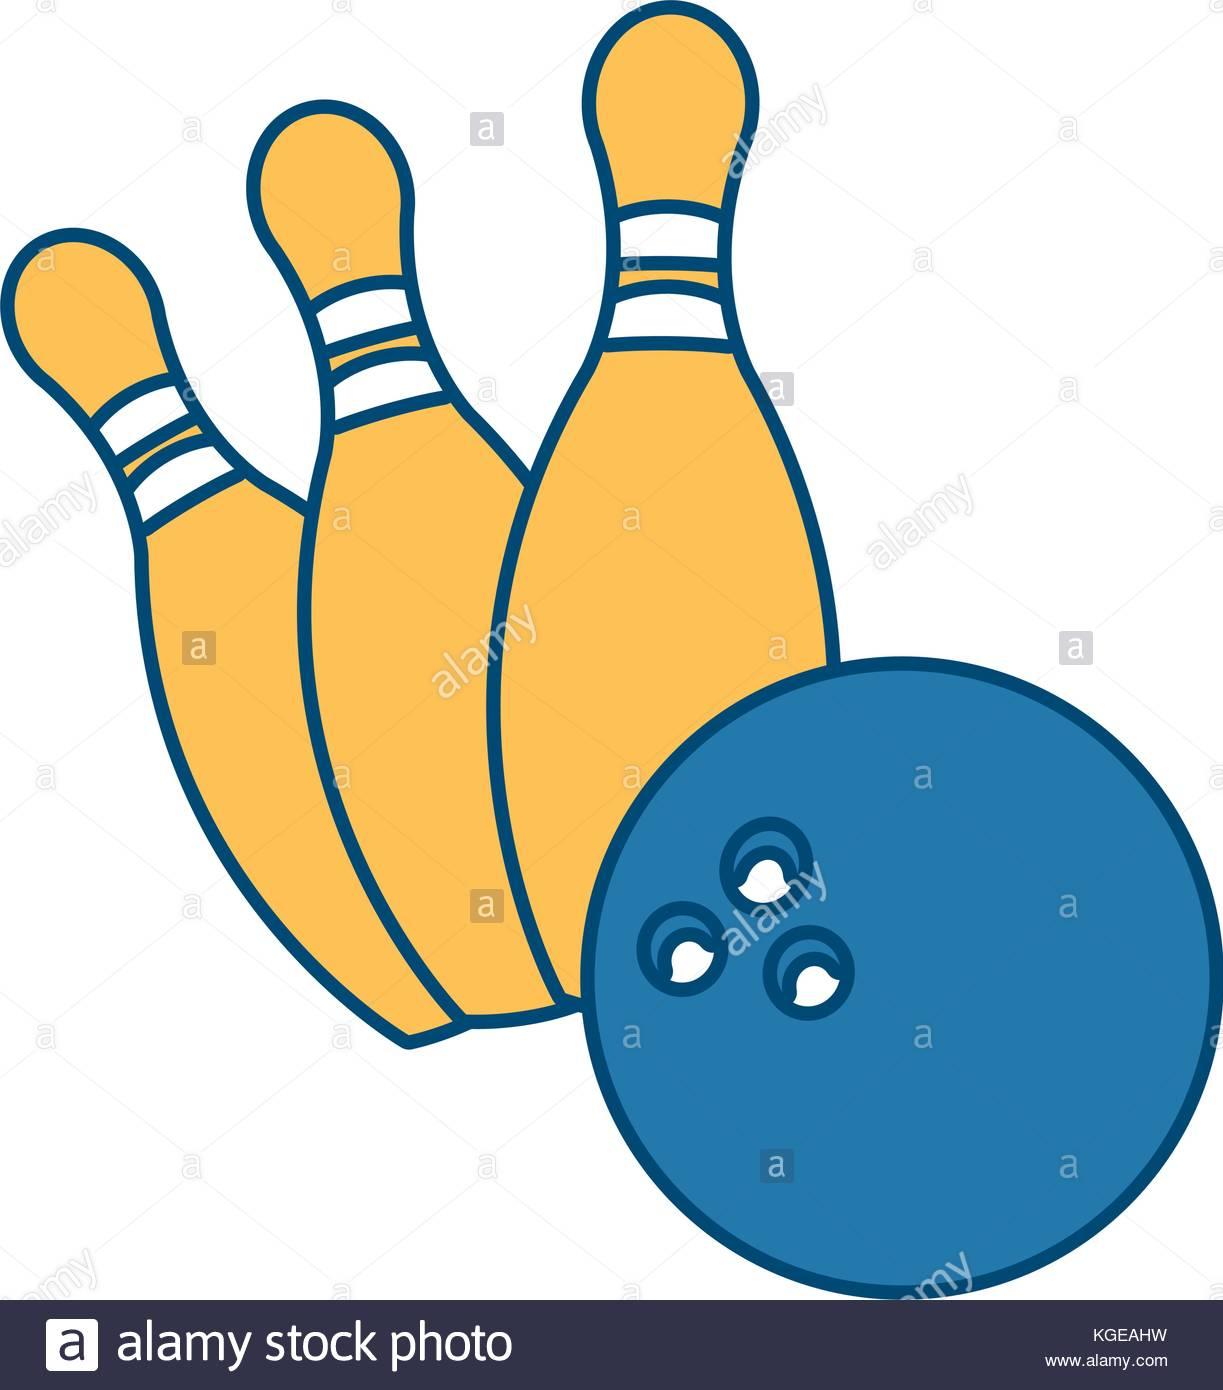 1223x1390 Yellow Bowling Pin Stock Photos Amp Yellow Bowling Pin Stock Images